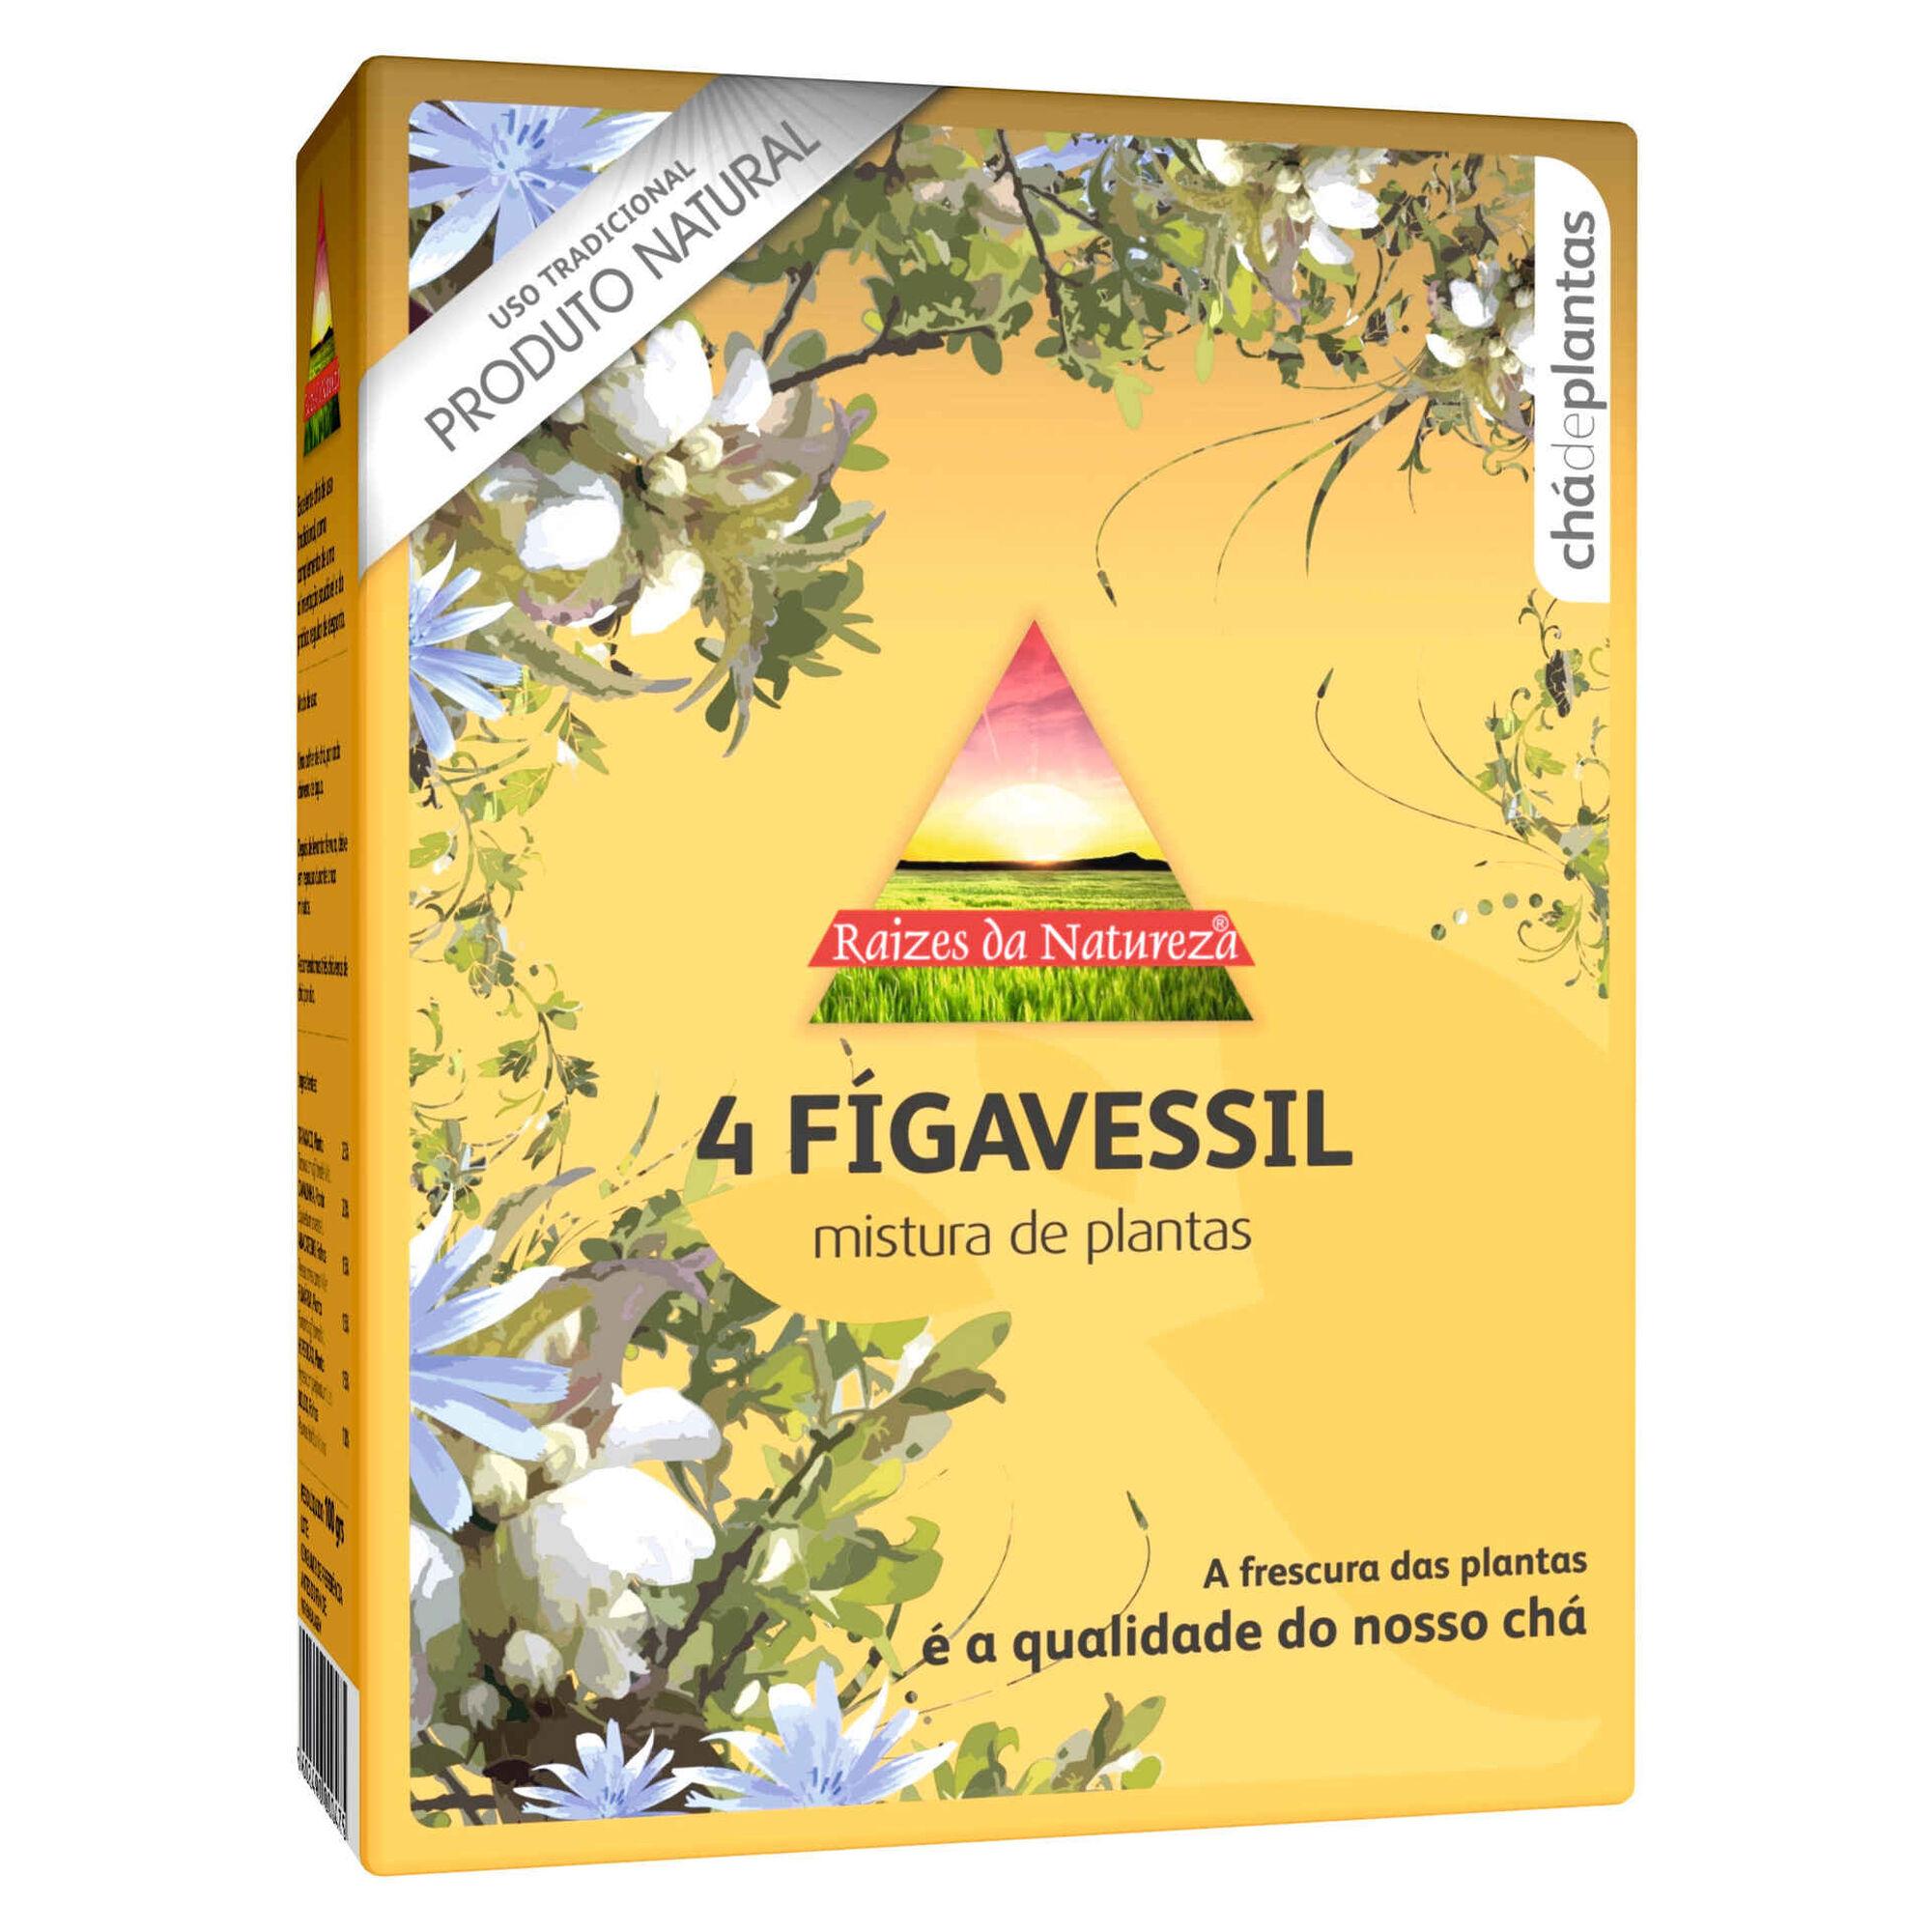 Chá de Plantas Nº4 Figavessil